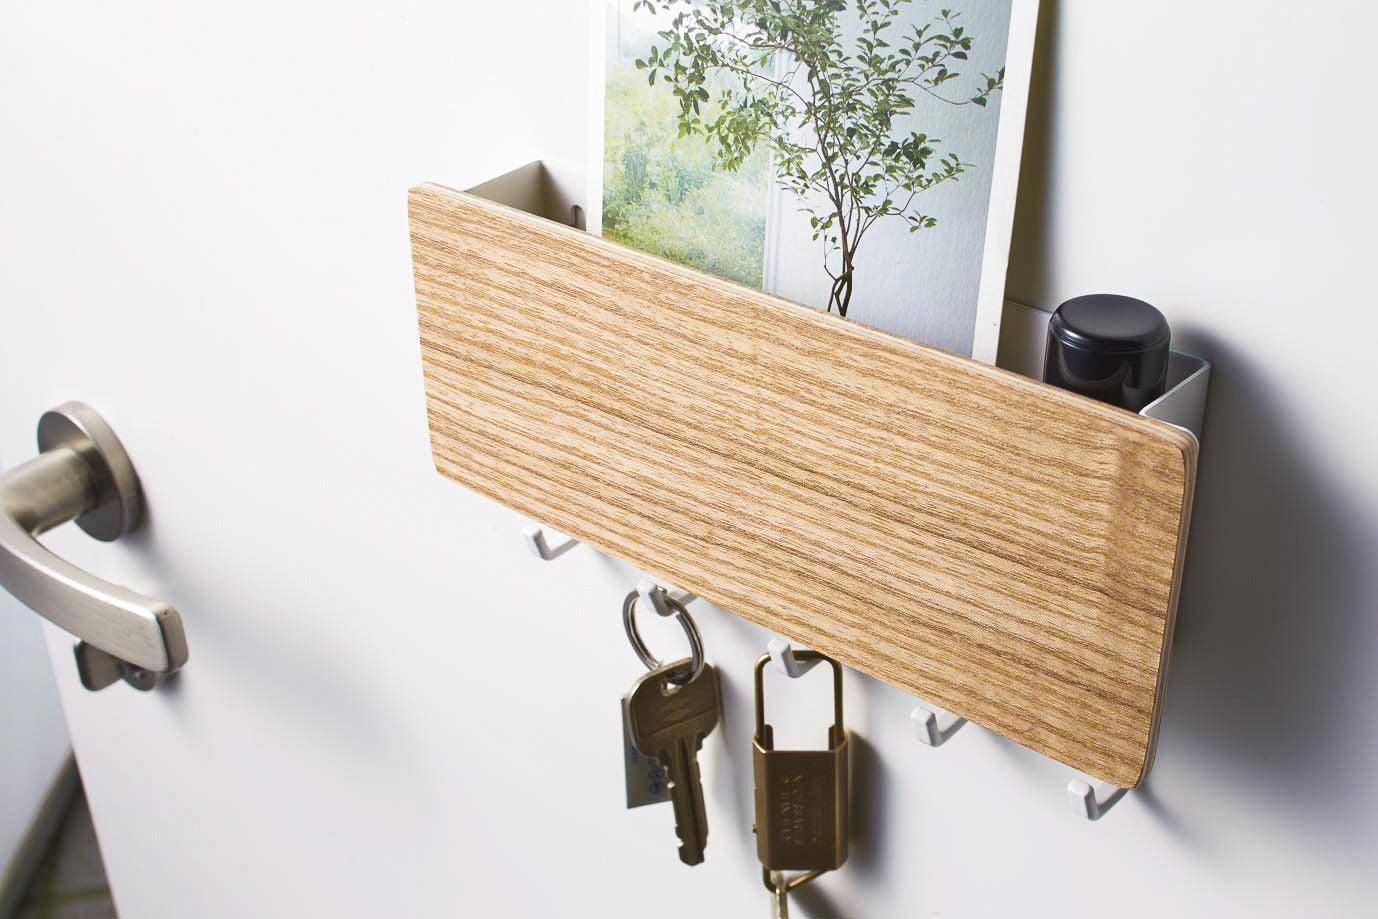 Yamazaki Rin Magnetic Key Rack with Tray